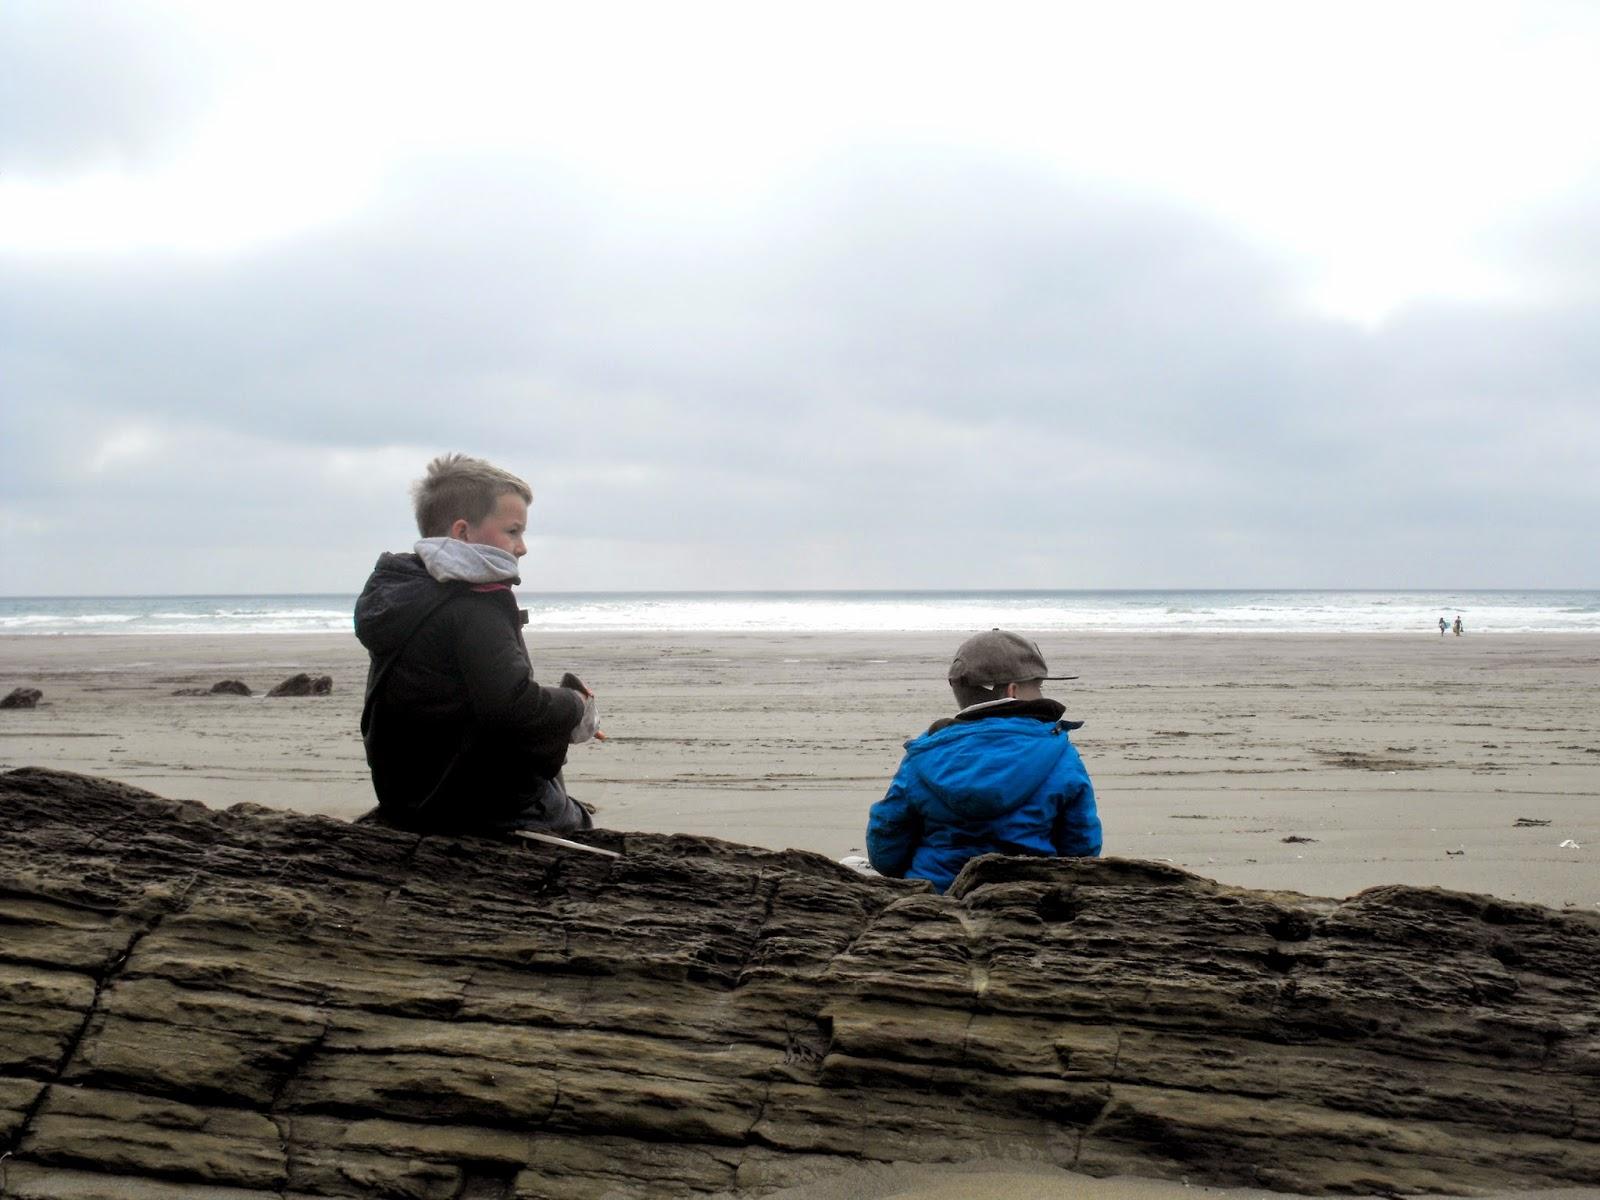 whitsand bay, rame, cornwall, tregantle, beach